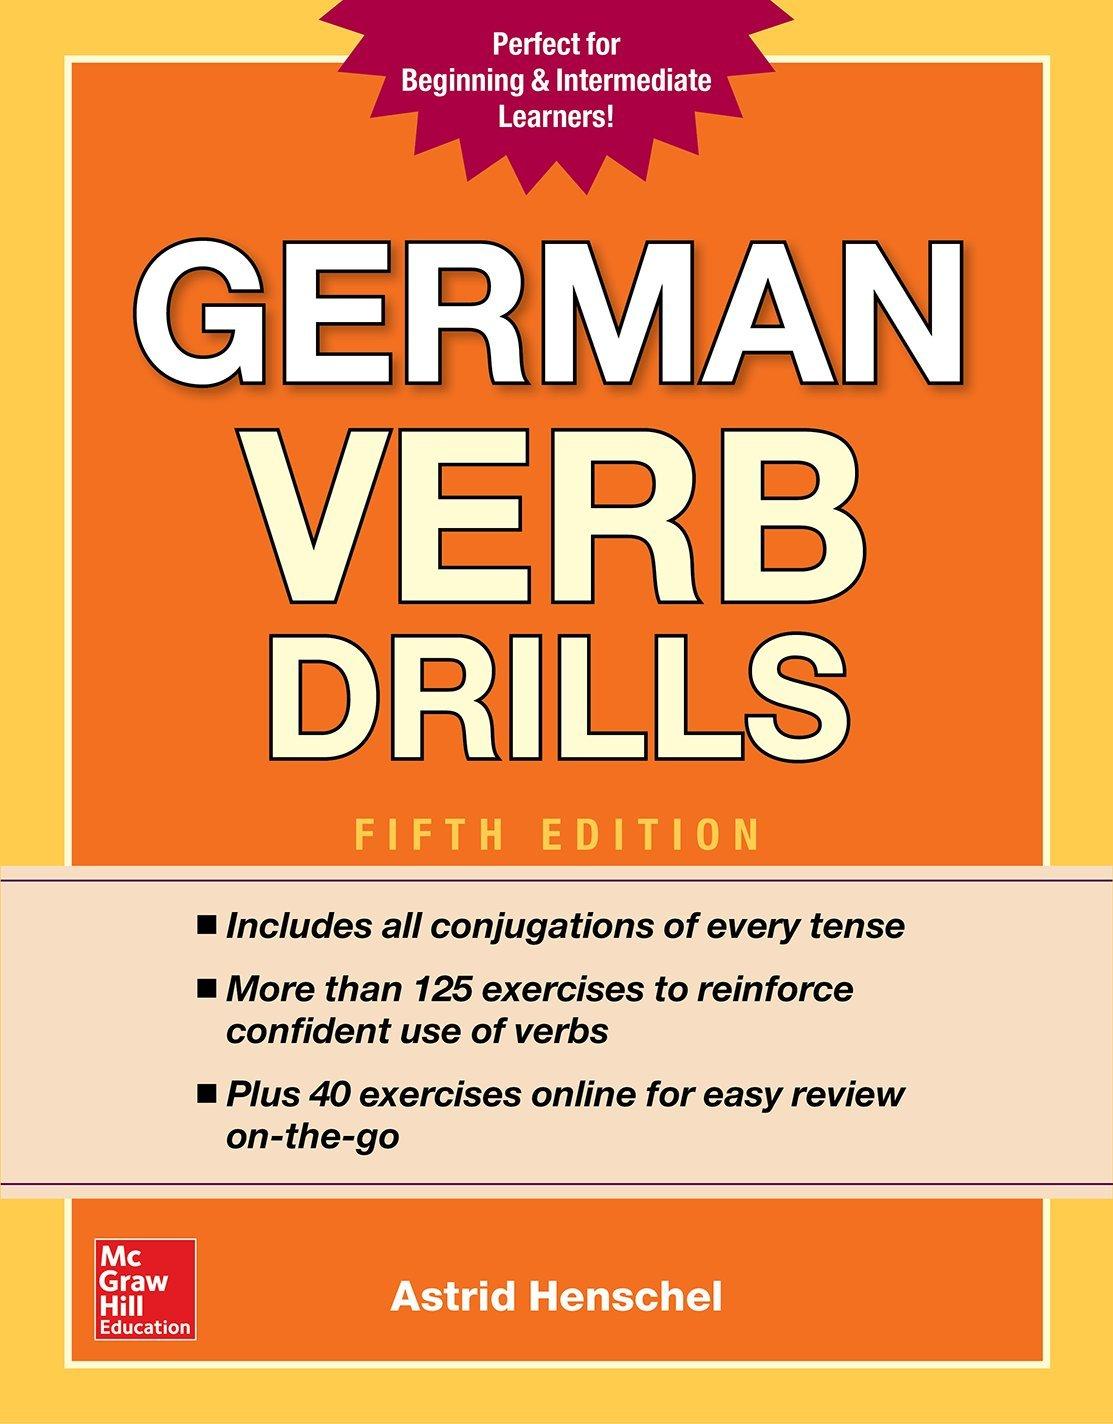 German verb drills fifth edition amazon co uk astrid henschel 9781260010602 books